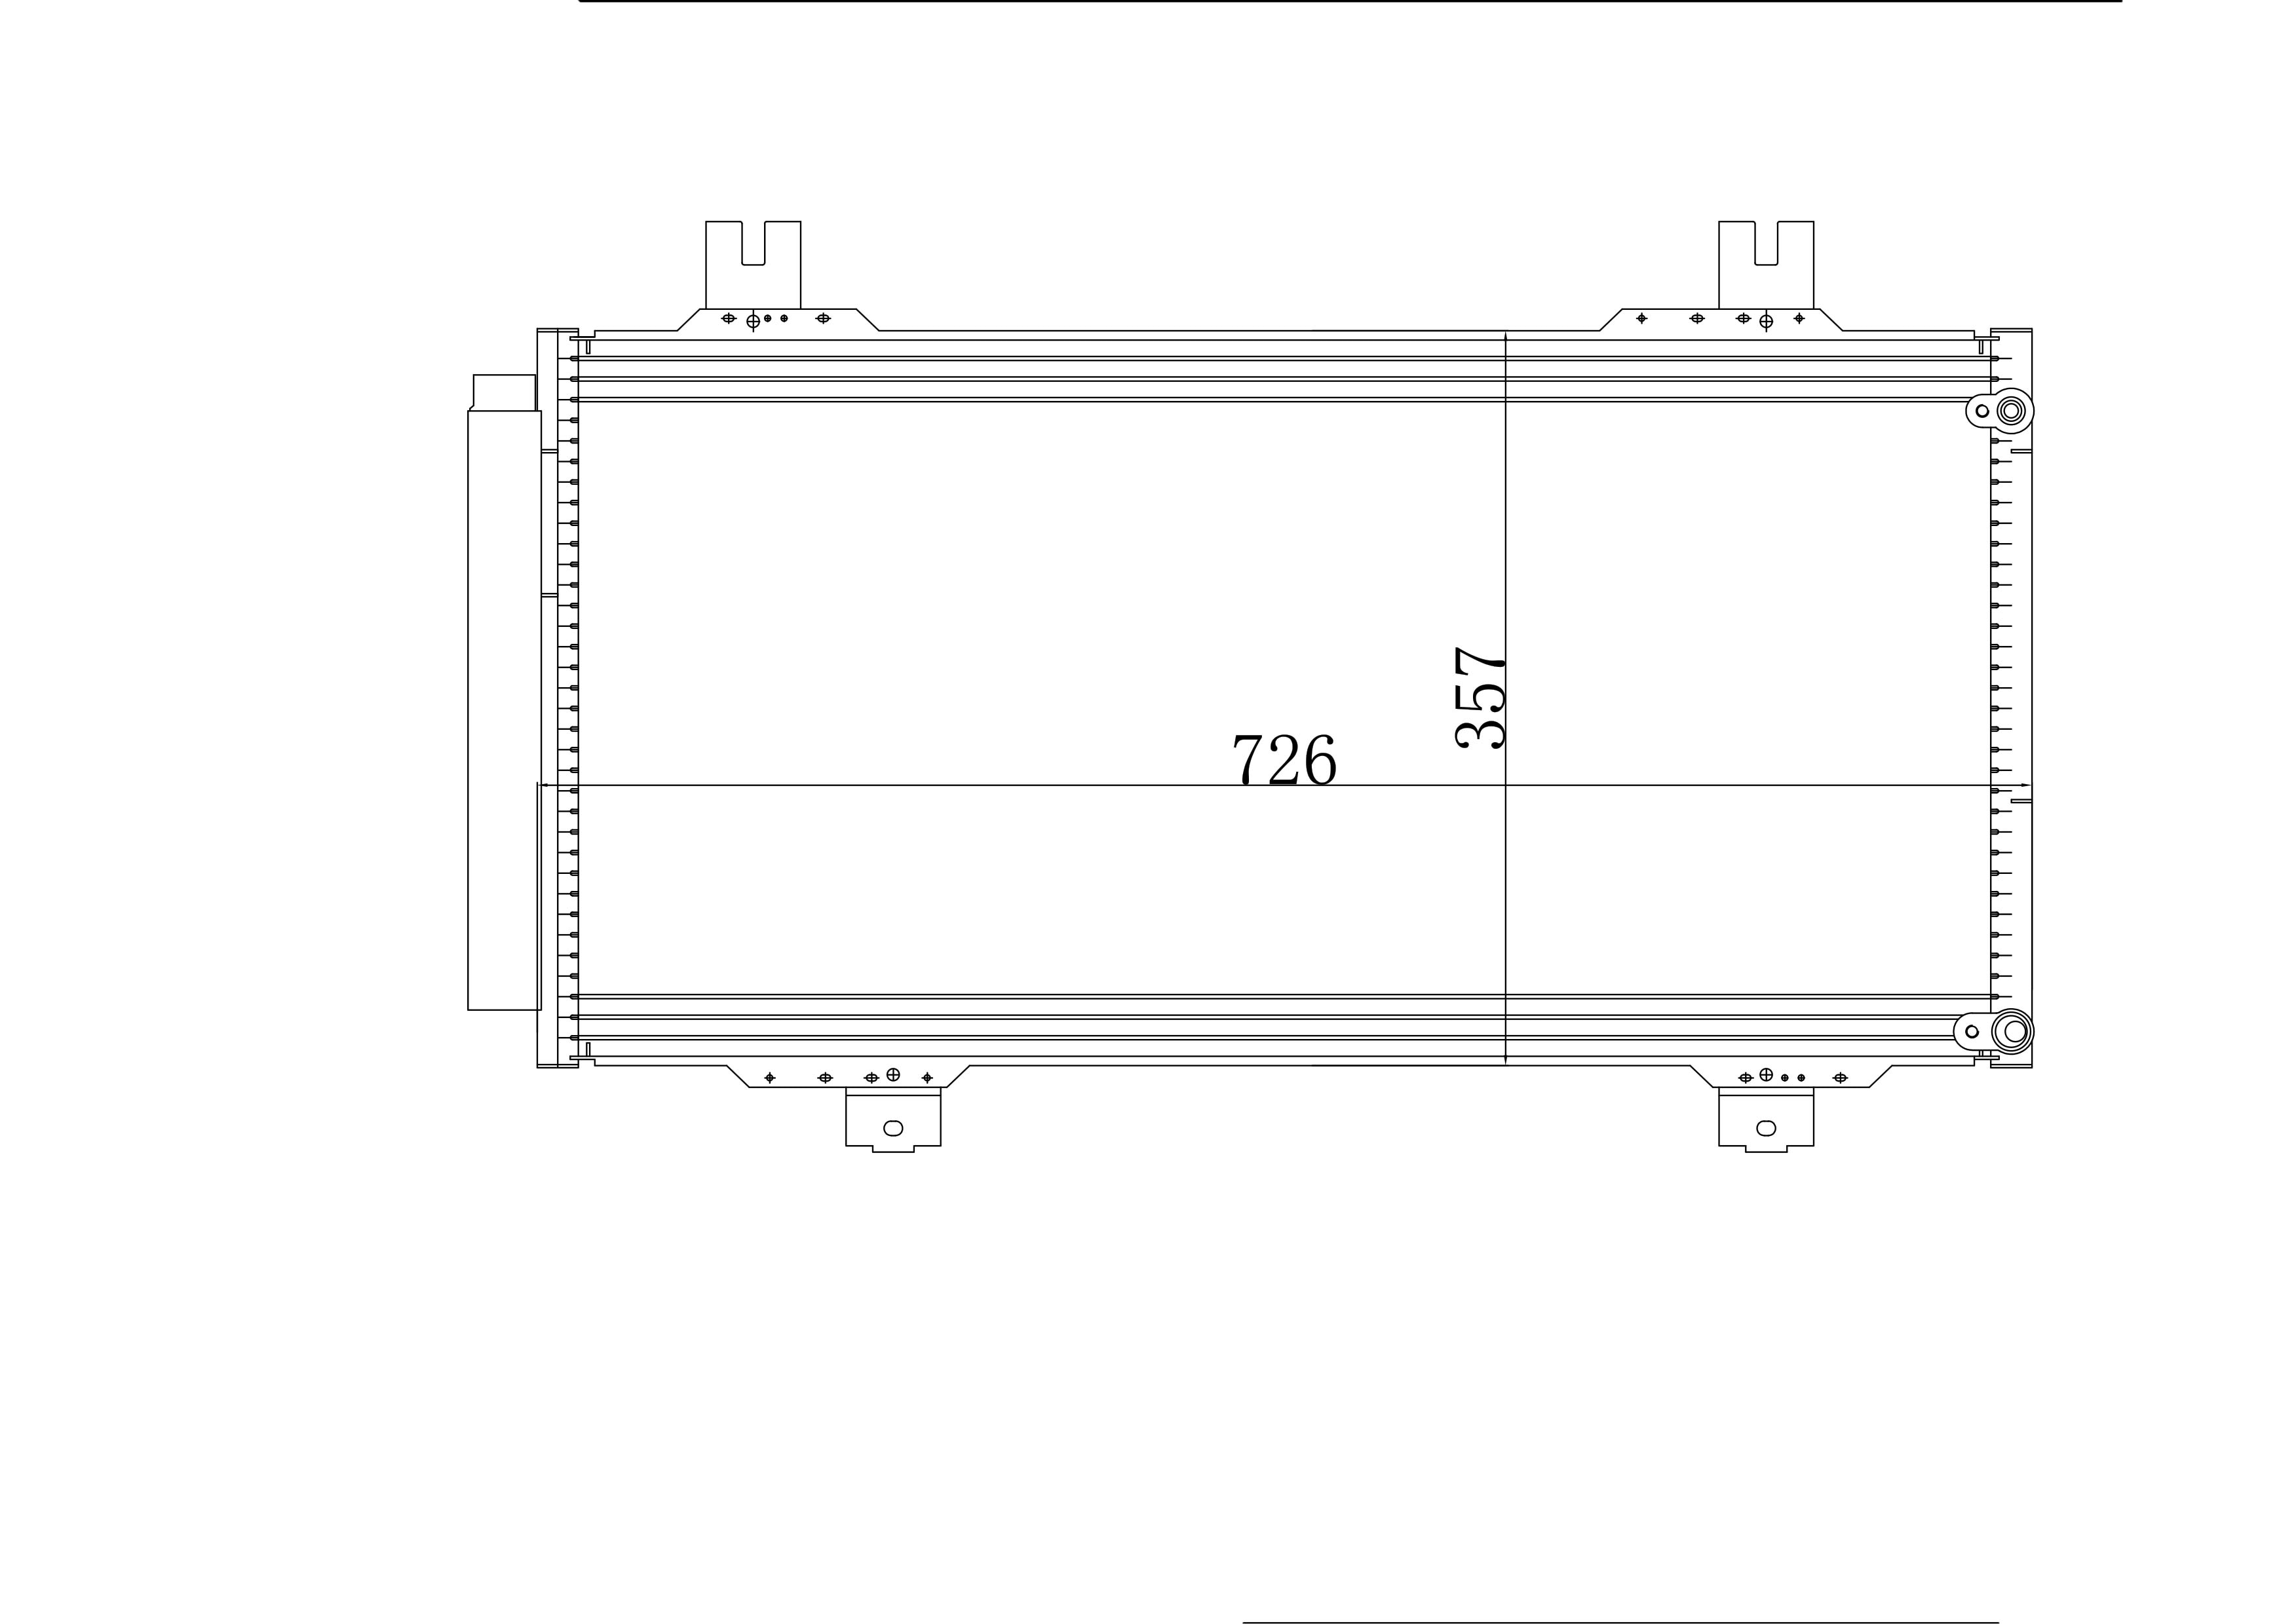 Ar condicionado ac a/c condensador apto para honda ajuste 2014 onda 5 80110-t5l-t01 80110t5lt01